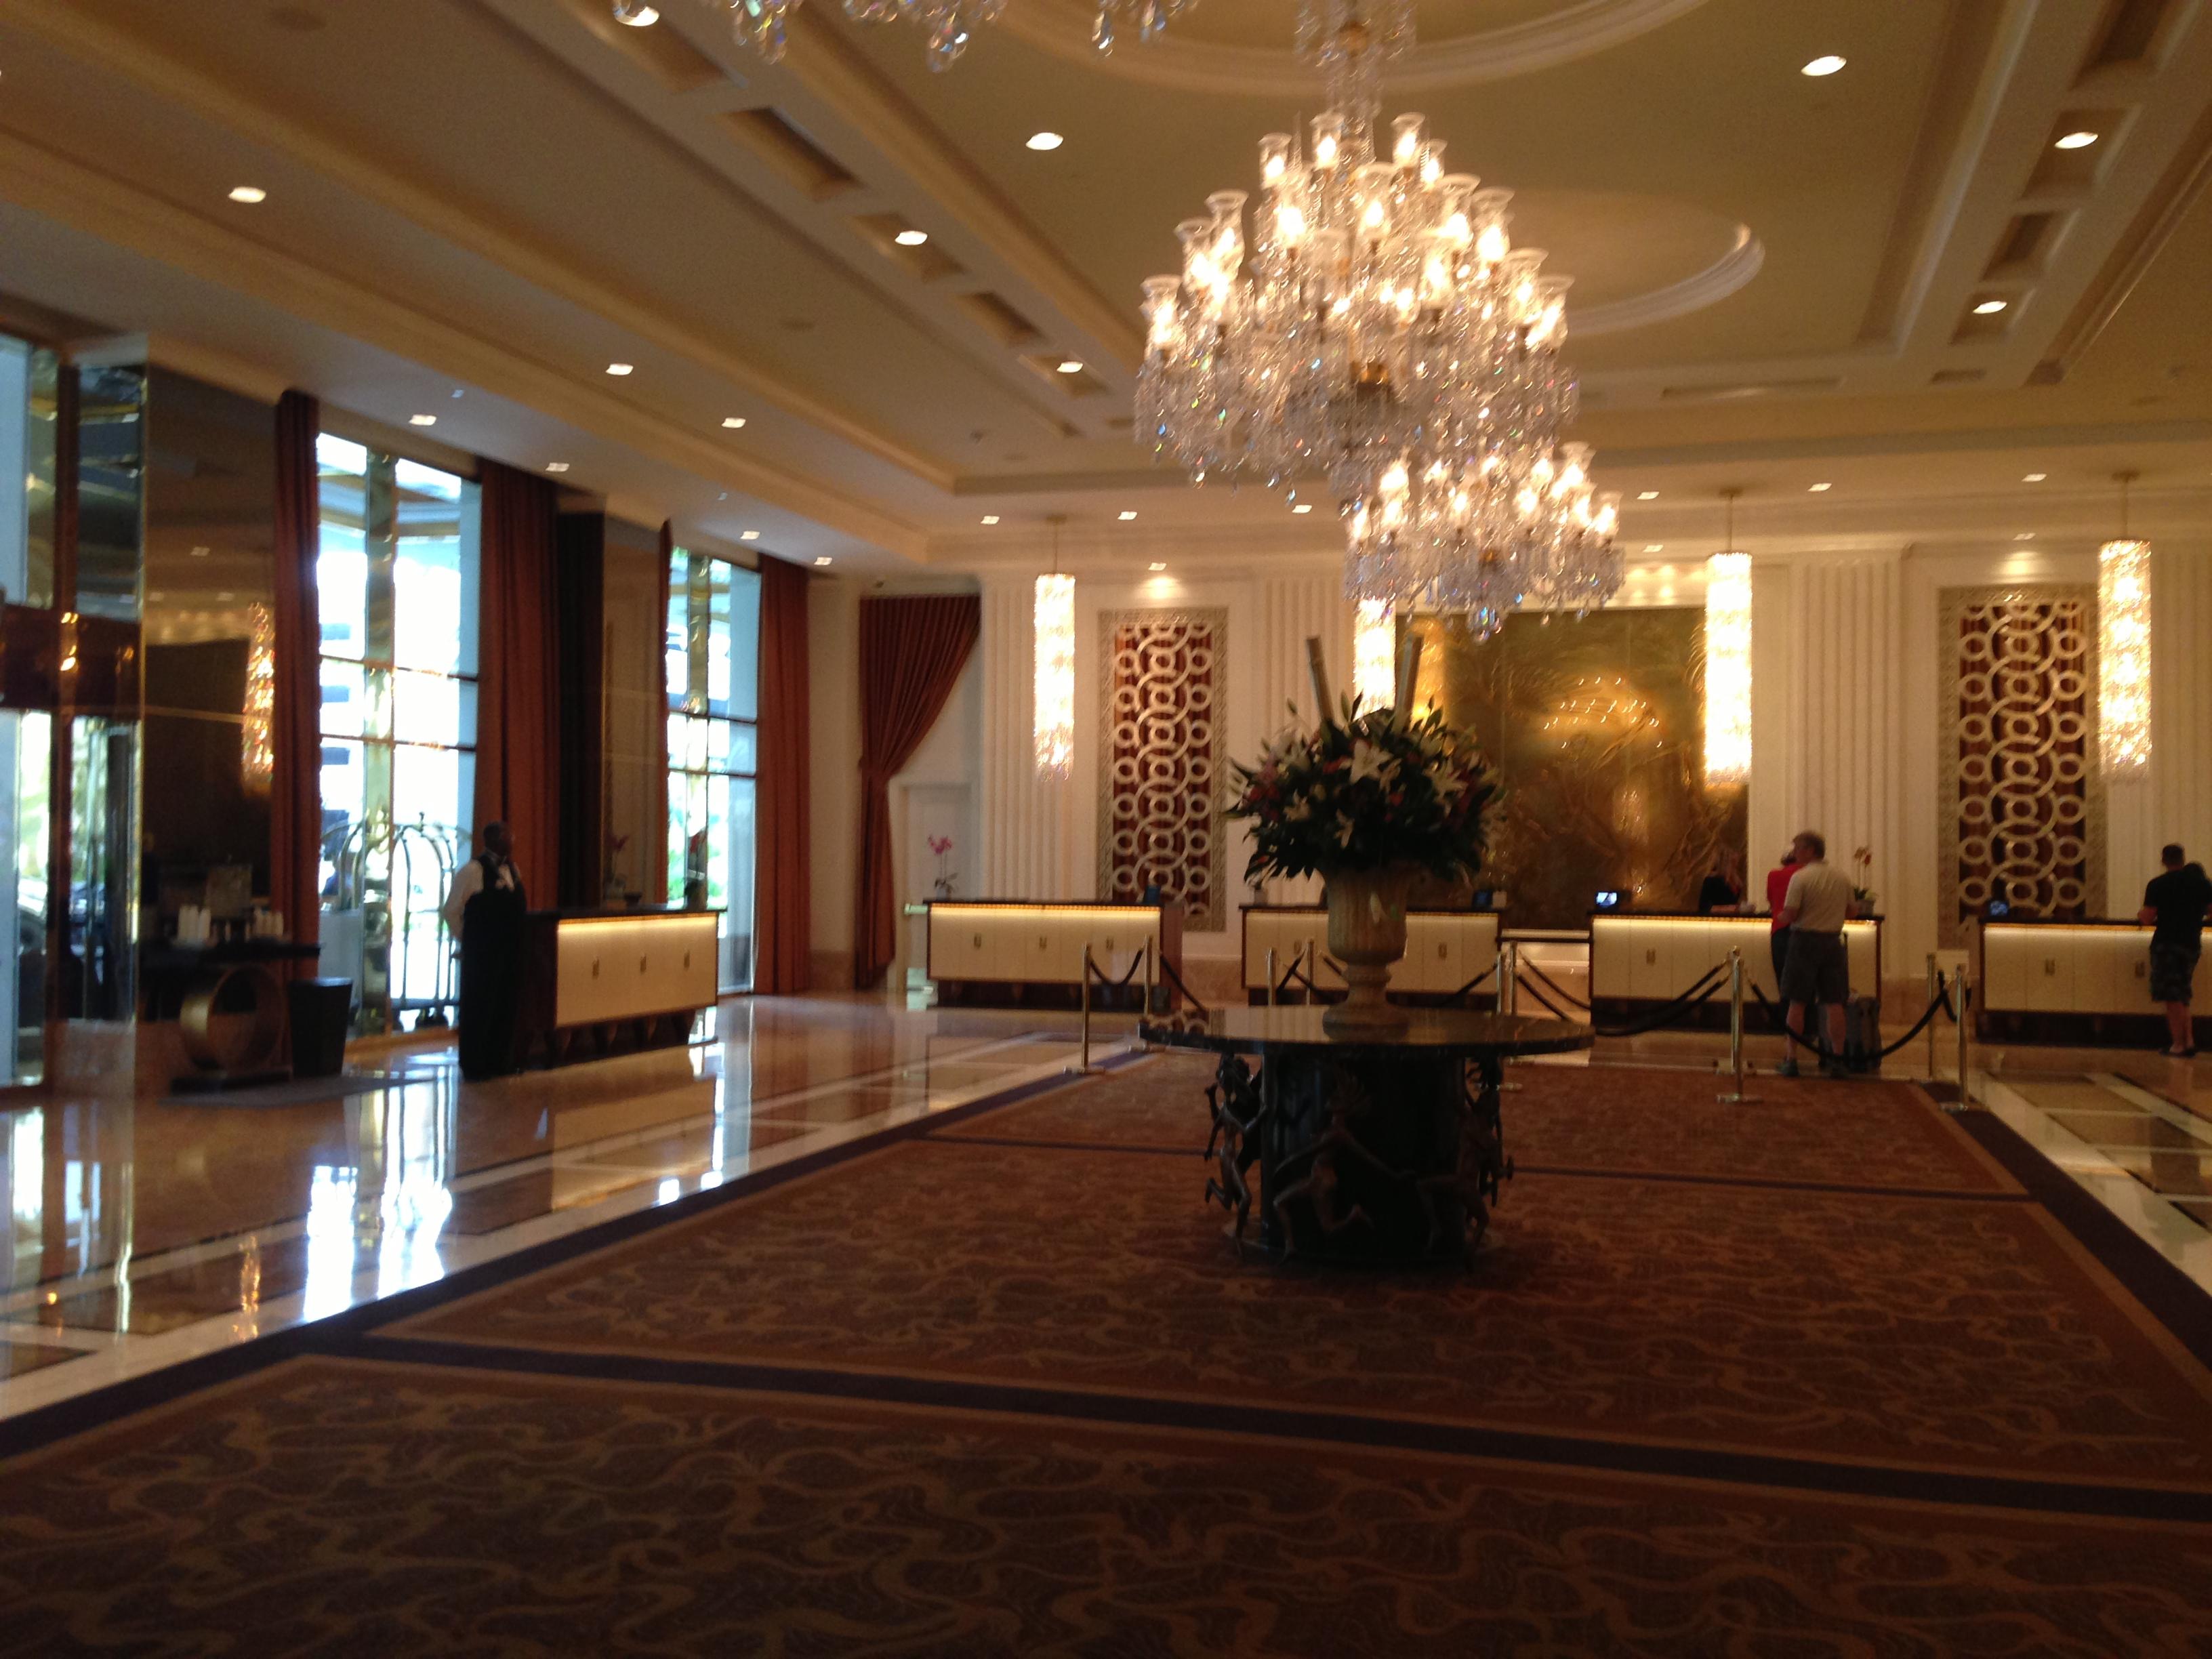 Las Vegas Trump International Hotel All The Glitz